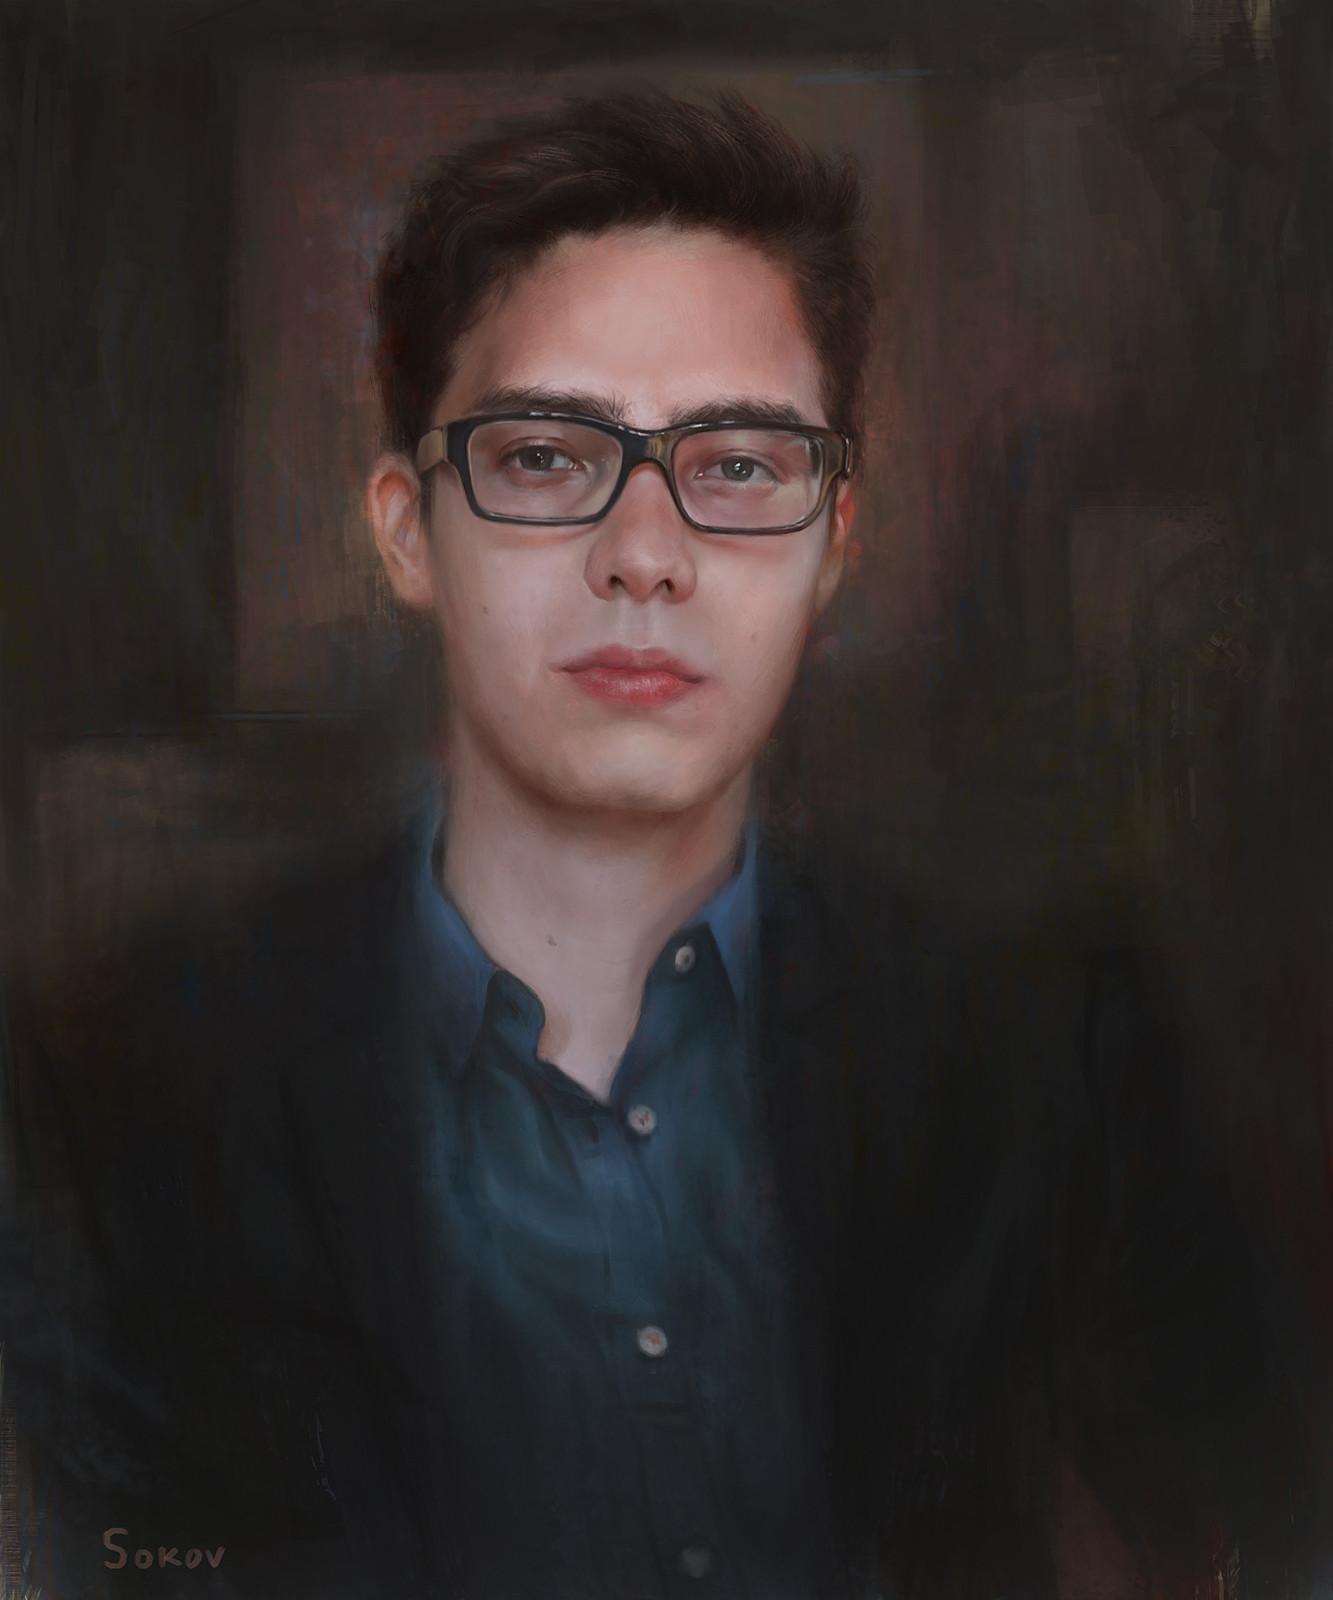 pintor_pavelsokov_6